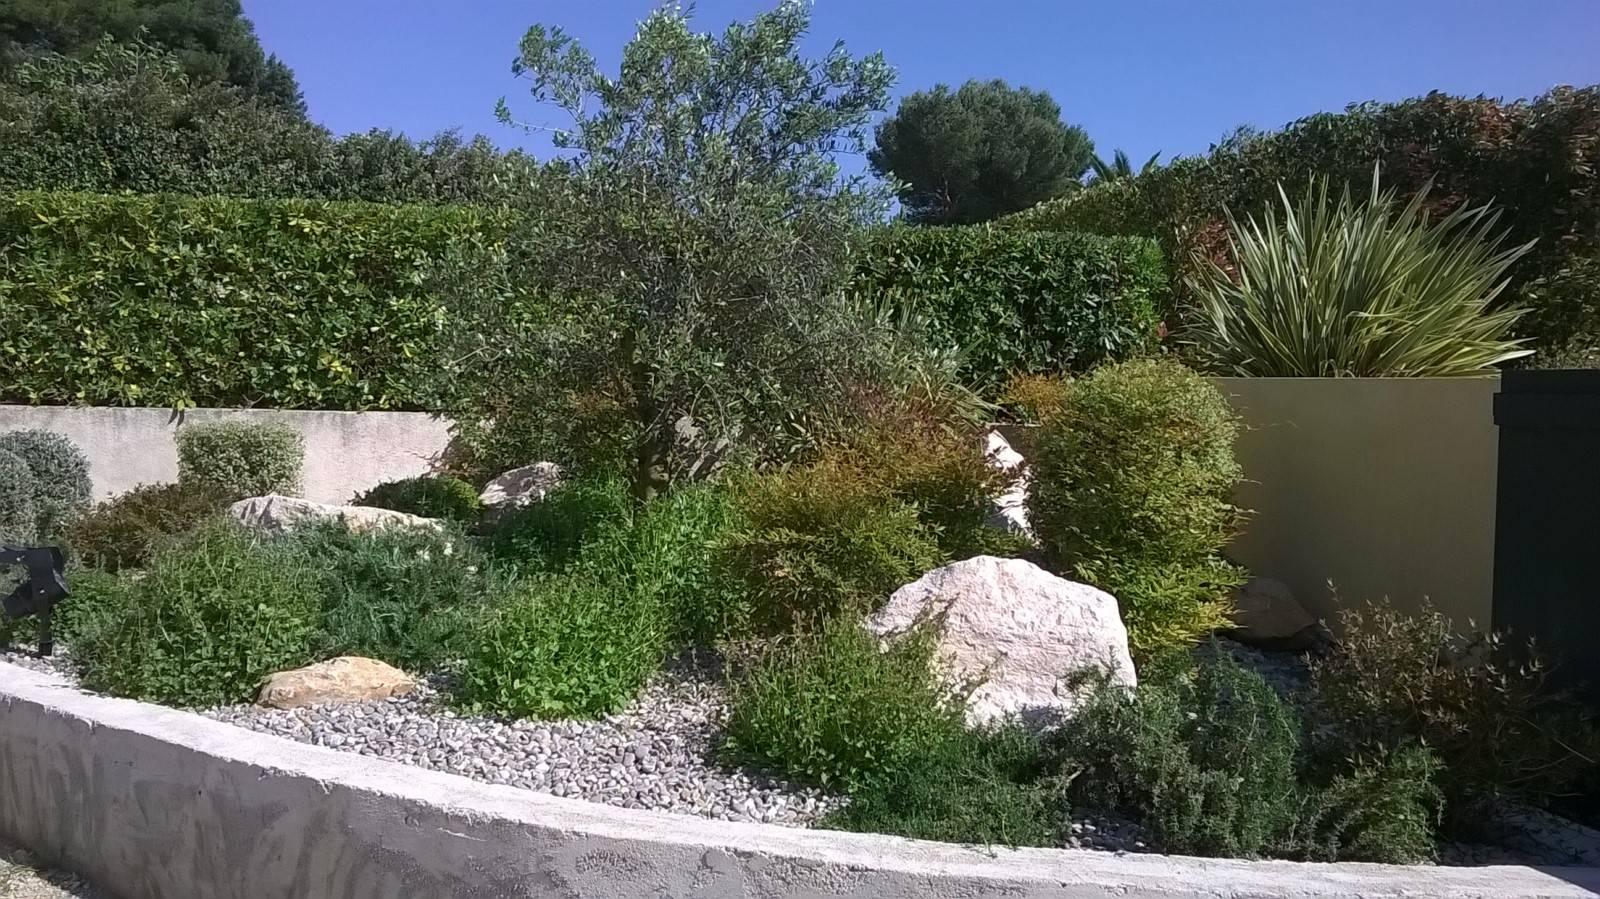 Aménagement Massif Mediterranéen Rognac 13340 - Amenagement ... tout Exemple De Jardin Méditerranéen